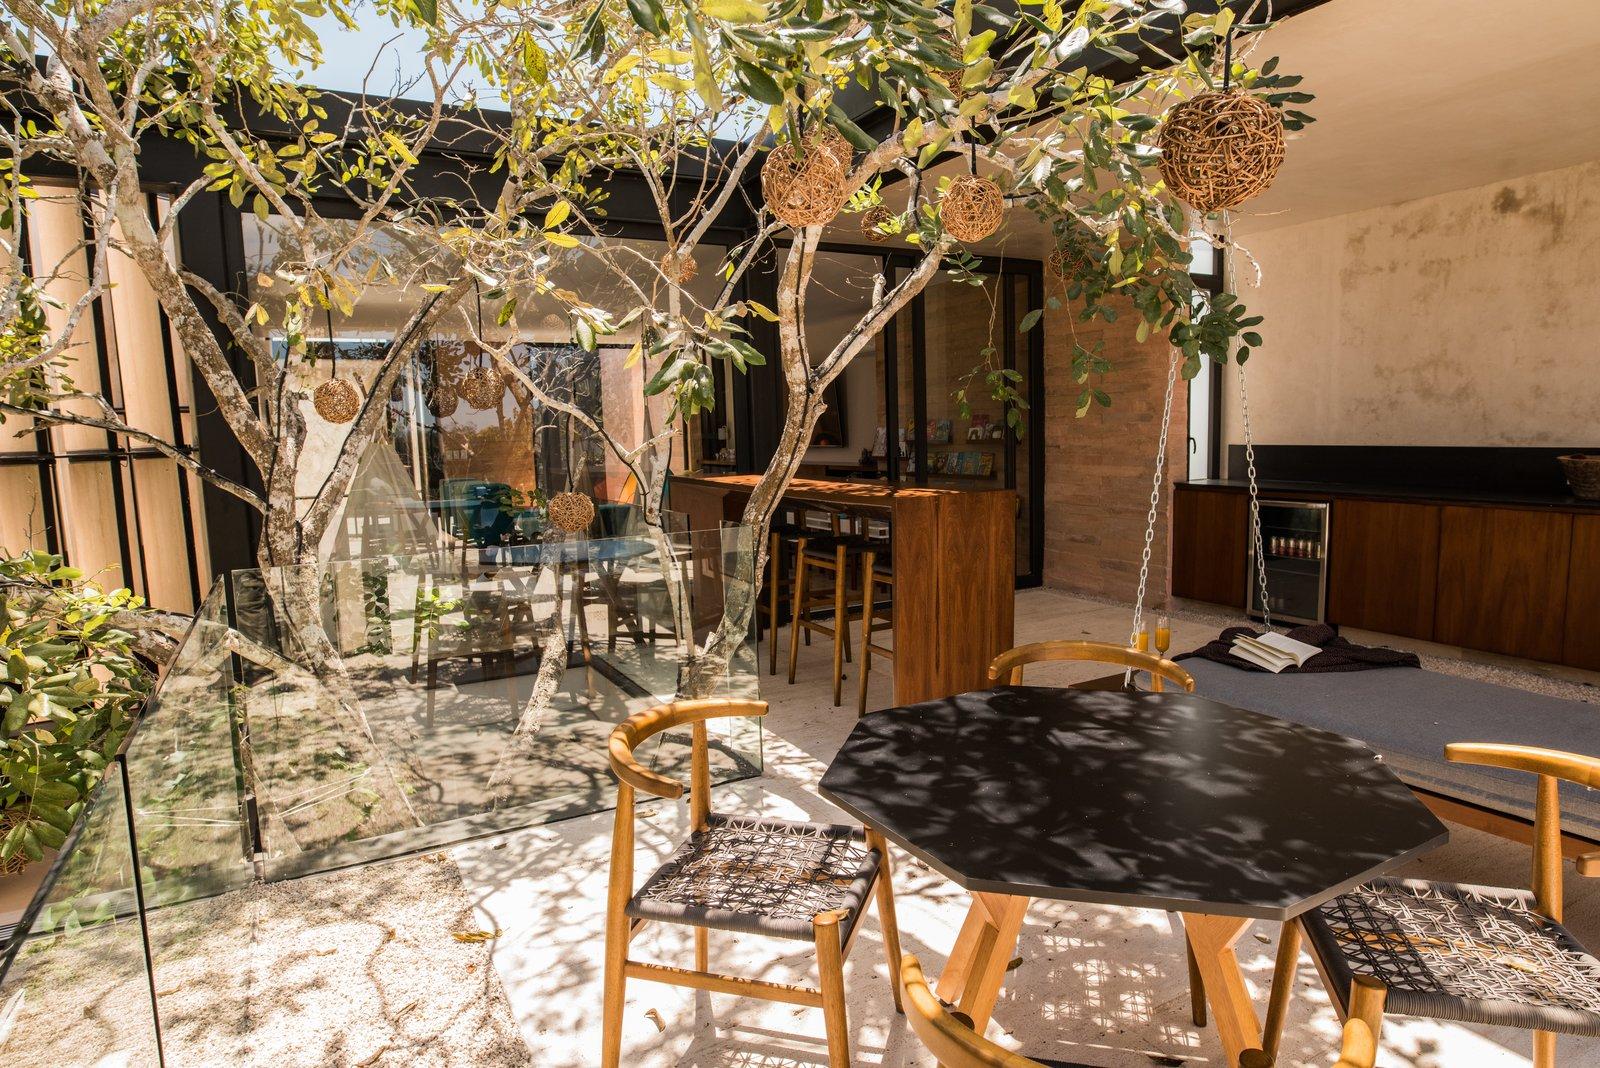 Outdoor, Rooftop, and Trees Jabin terrace  Casa Chaaltun by tescala